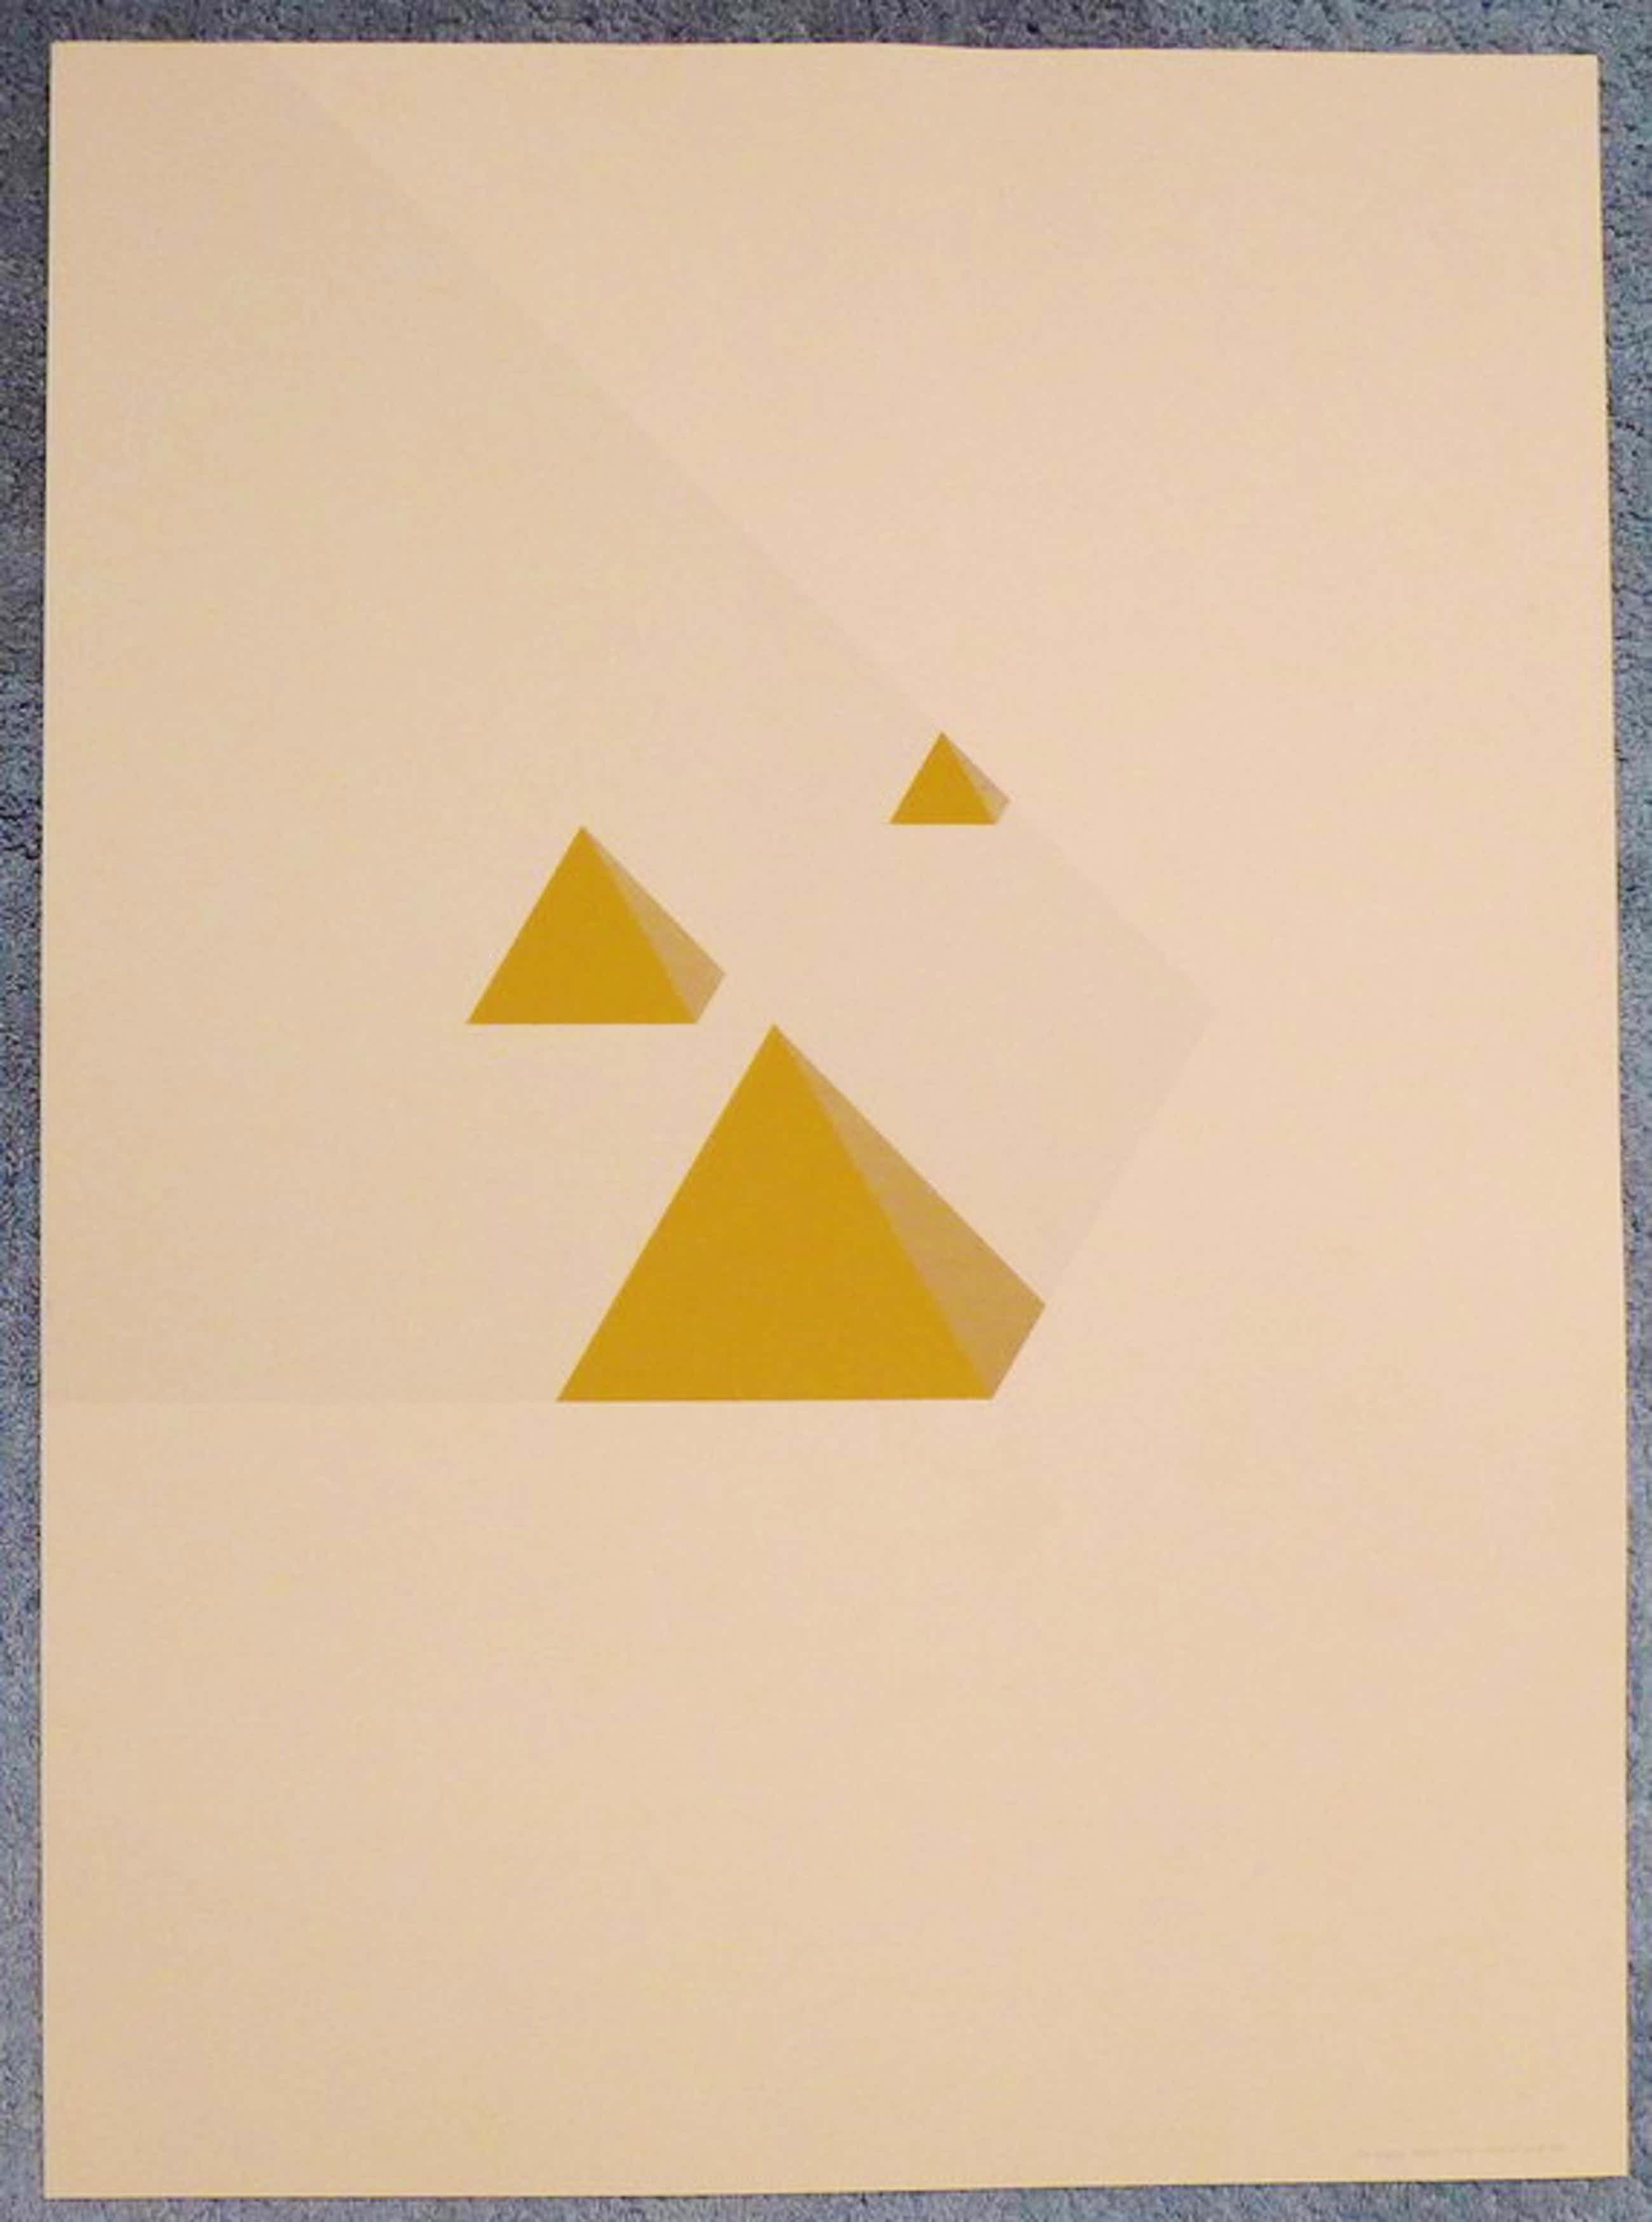 Frits Hesseling - Frits Hesseling, zeefdruk uit 1986. oplage 2/8 kopen? Bied vanaf 25!